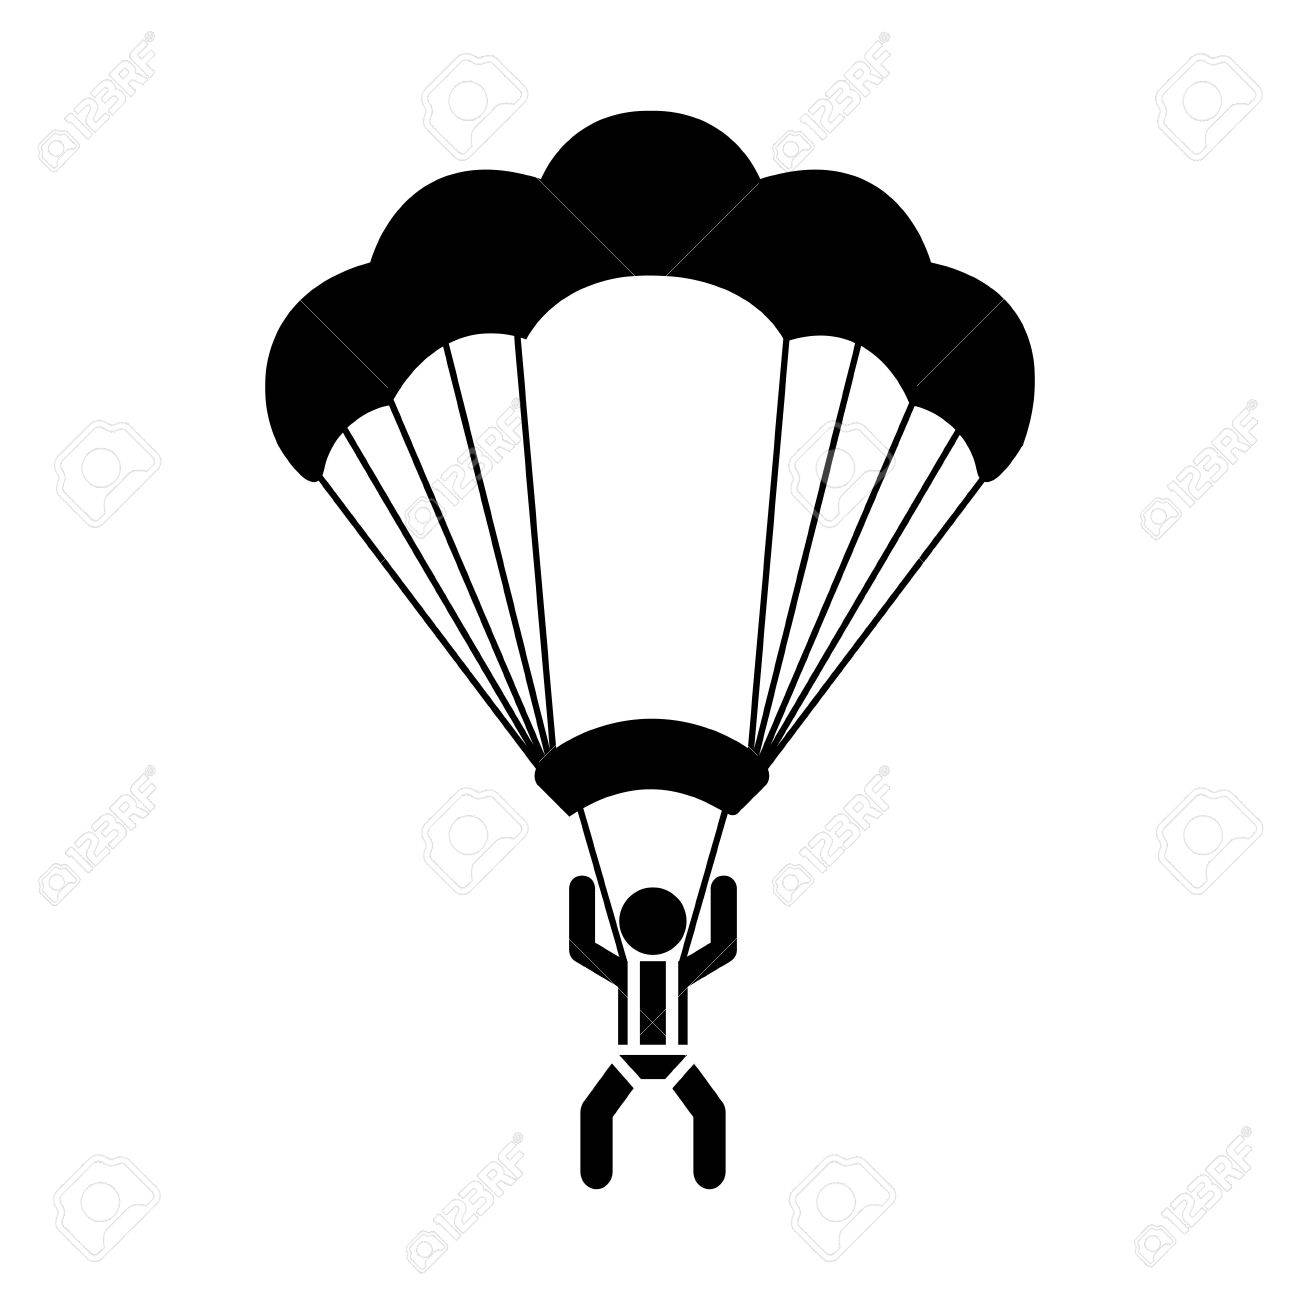 Skydiver Silhouette At Getdrawings